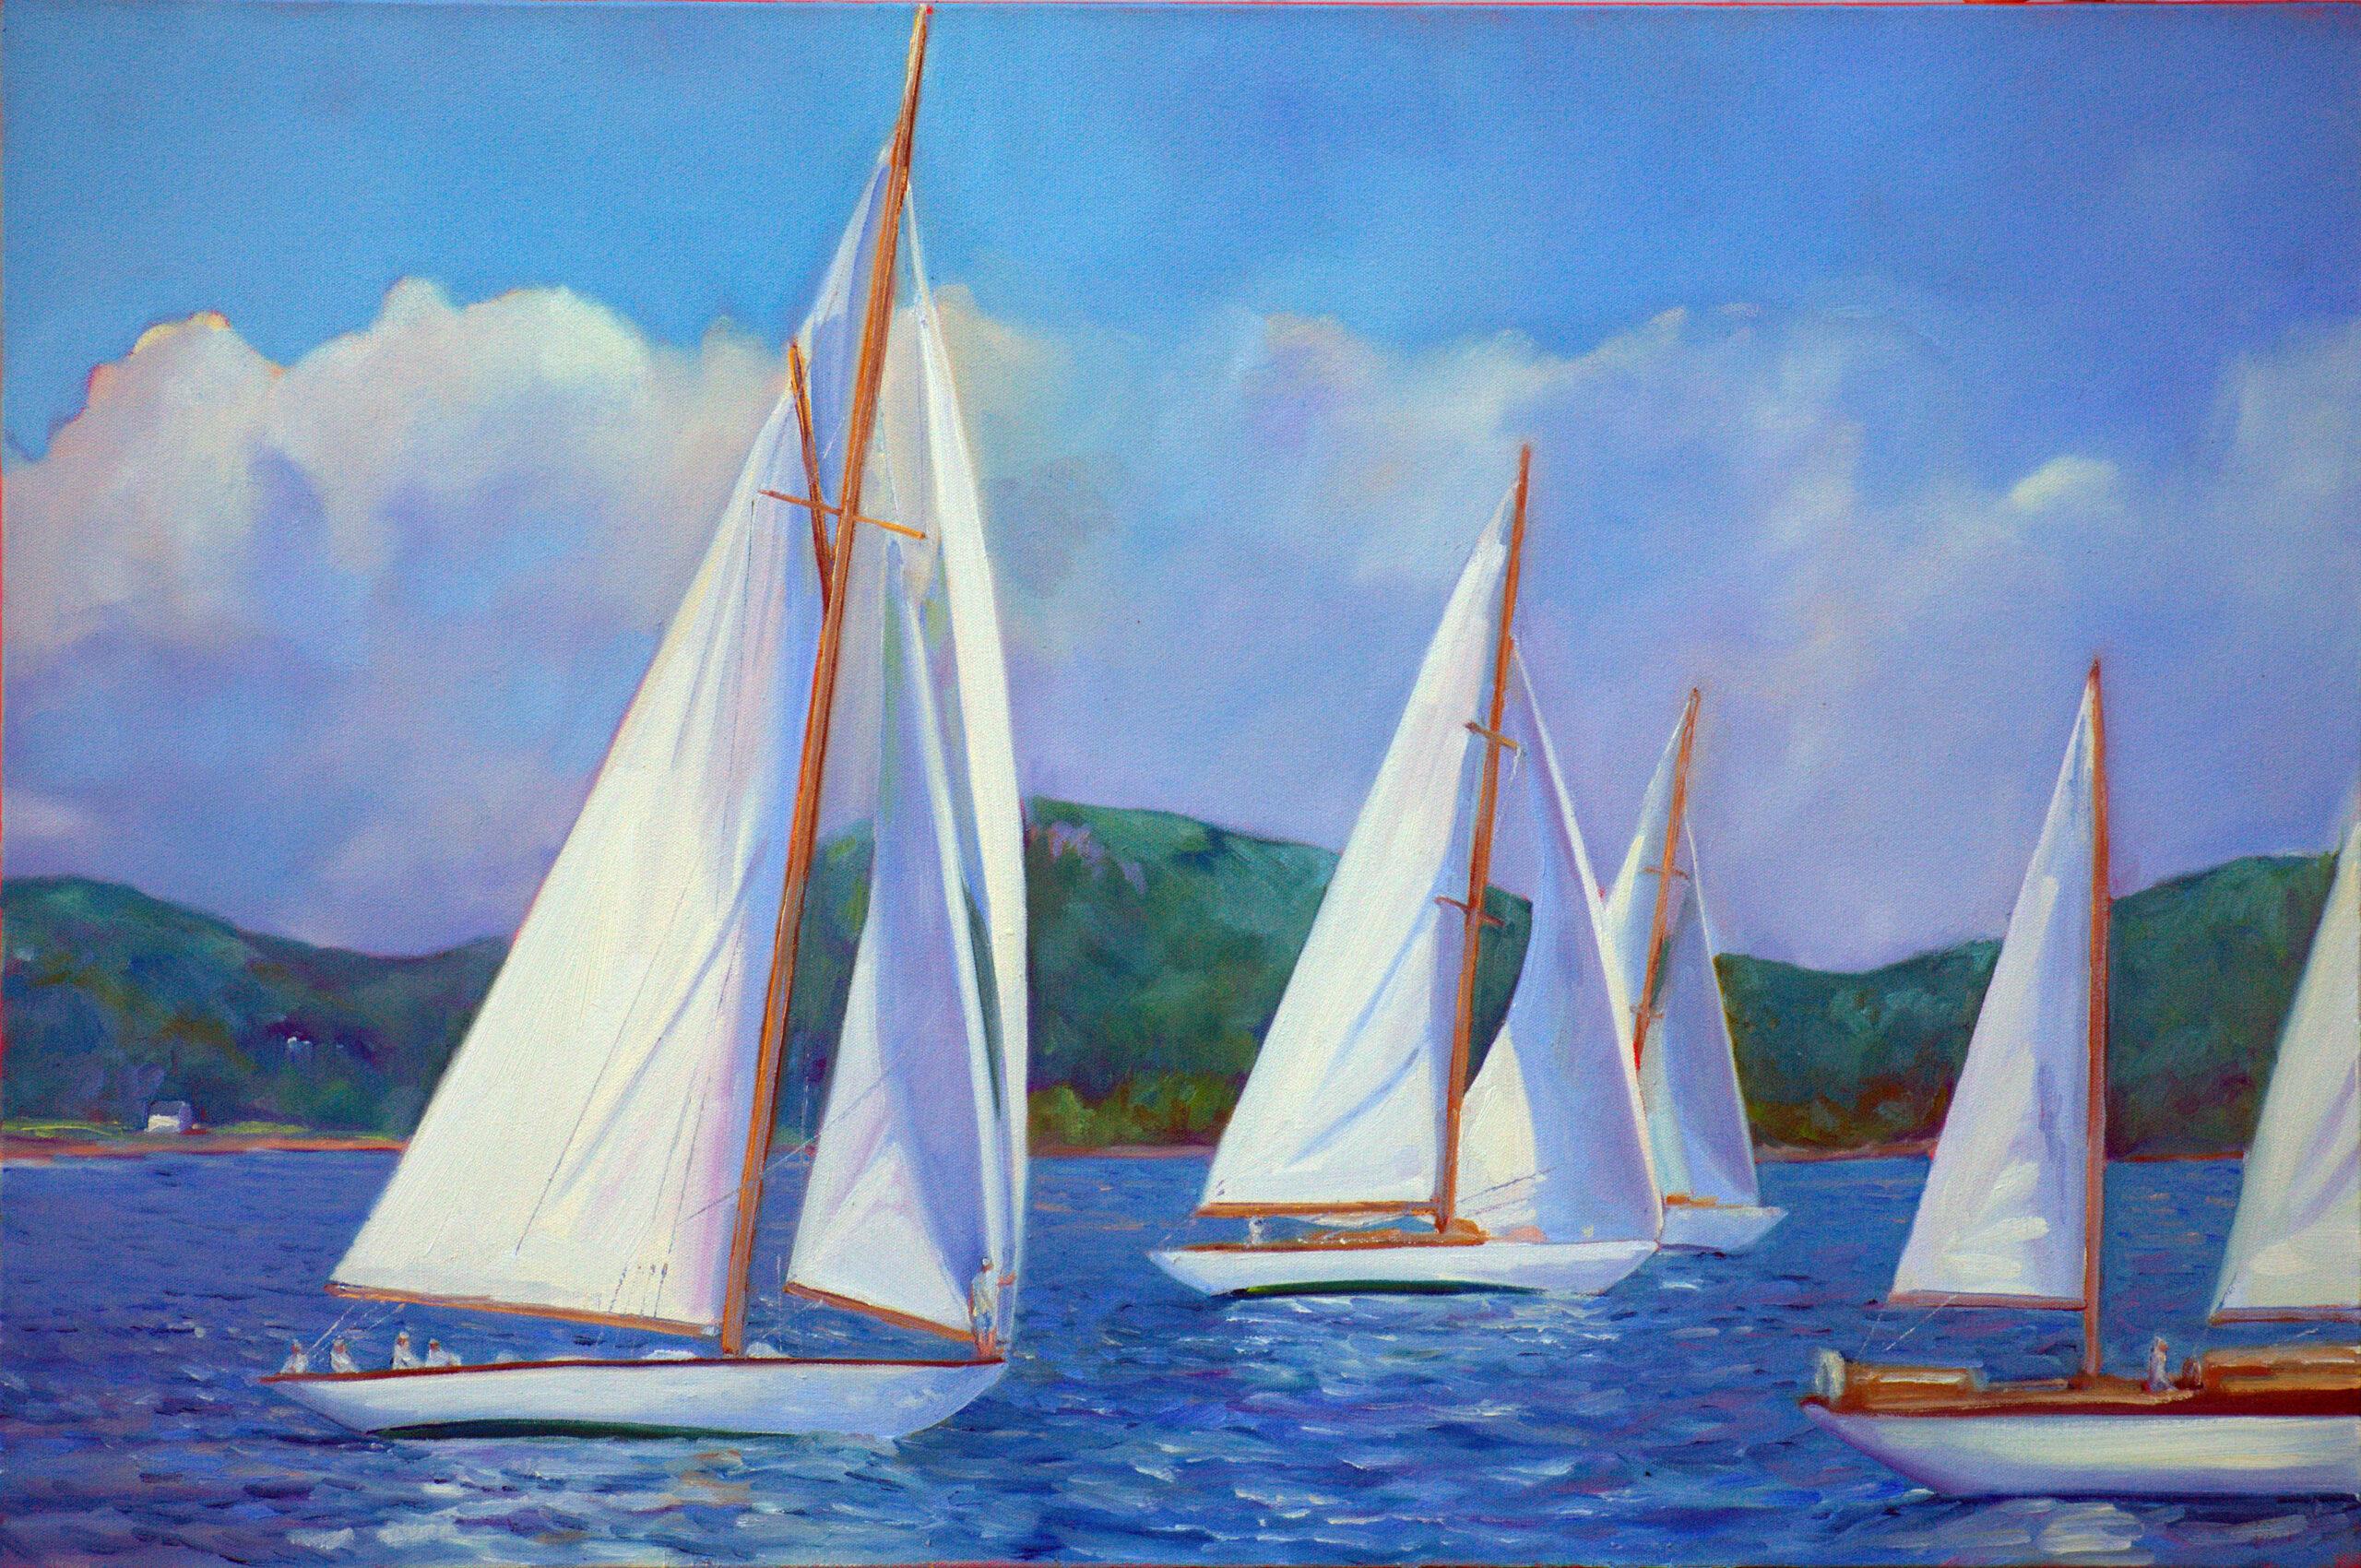 24X36, oil on canvas, $3,188 unframed